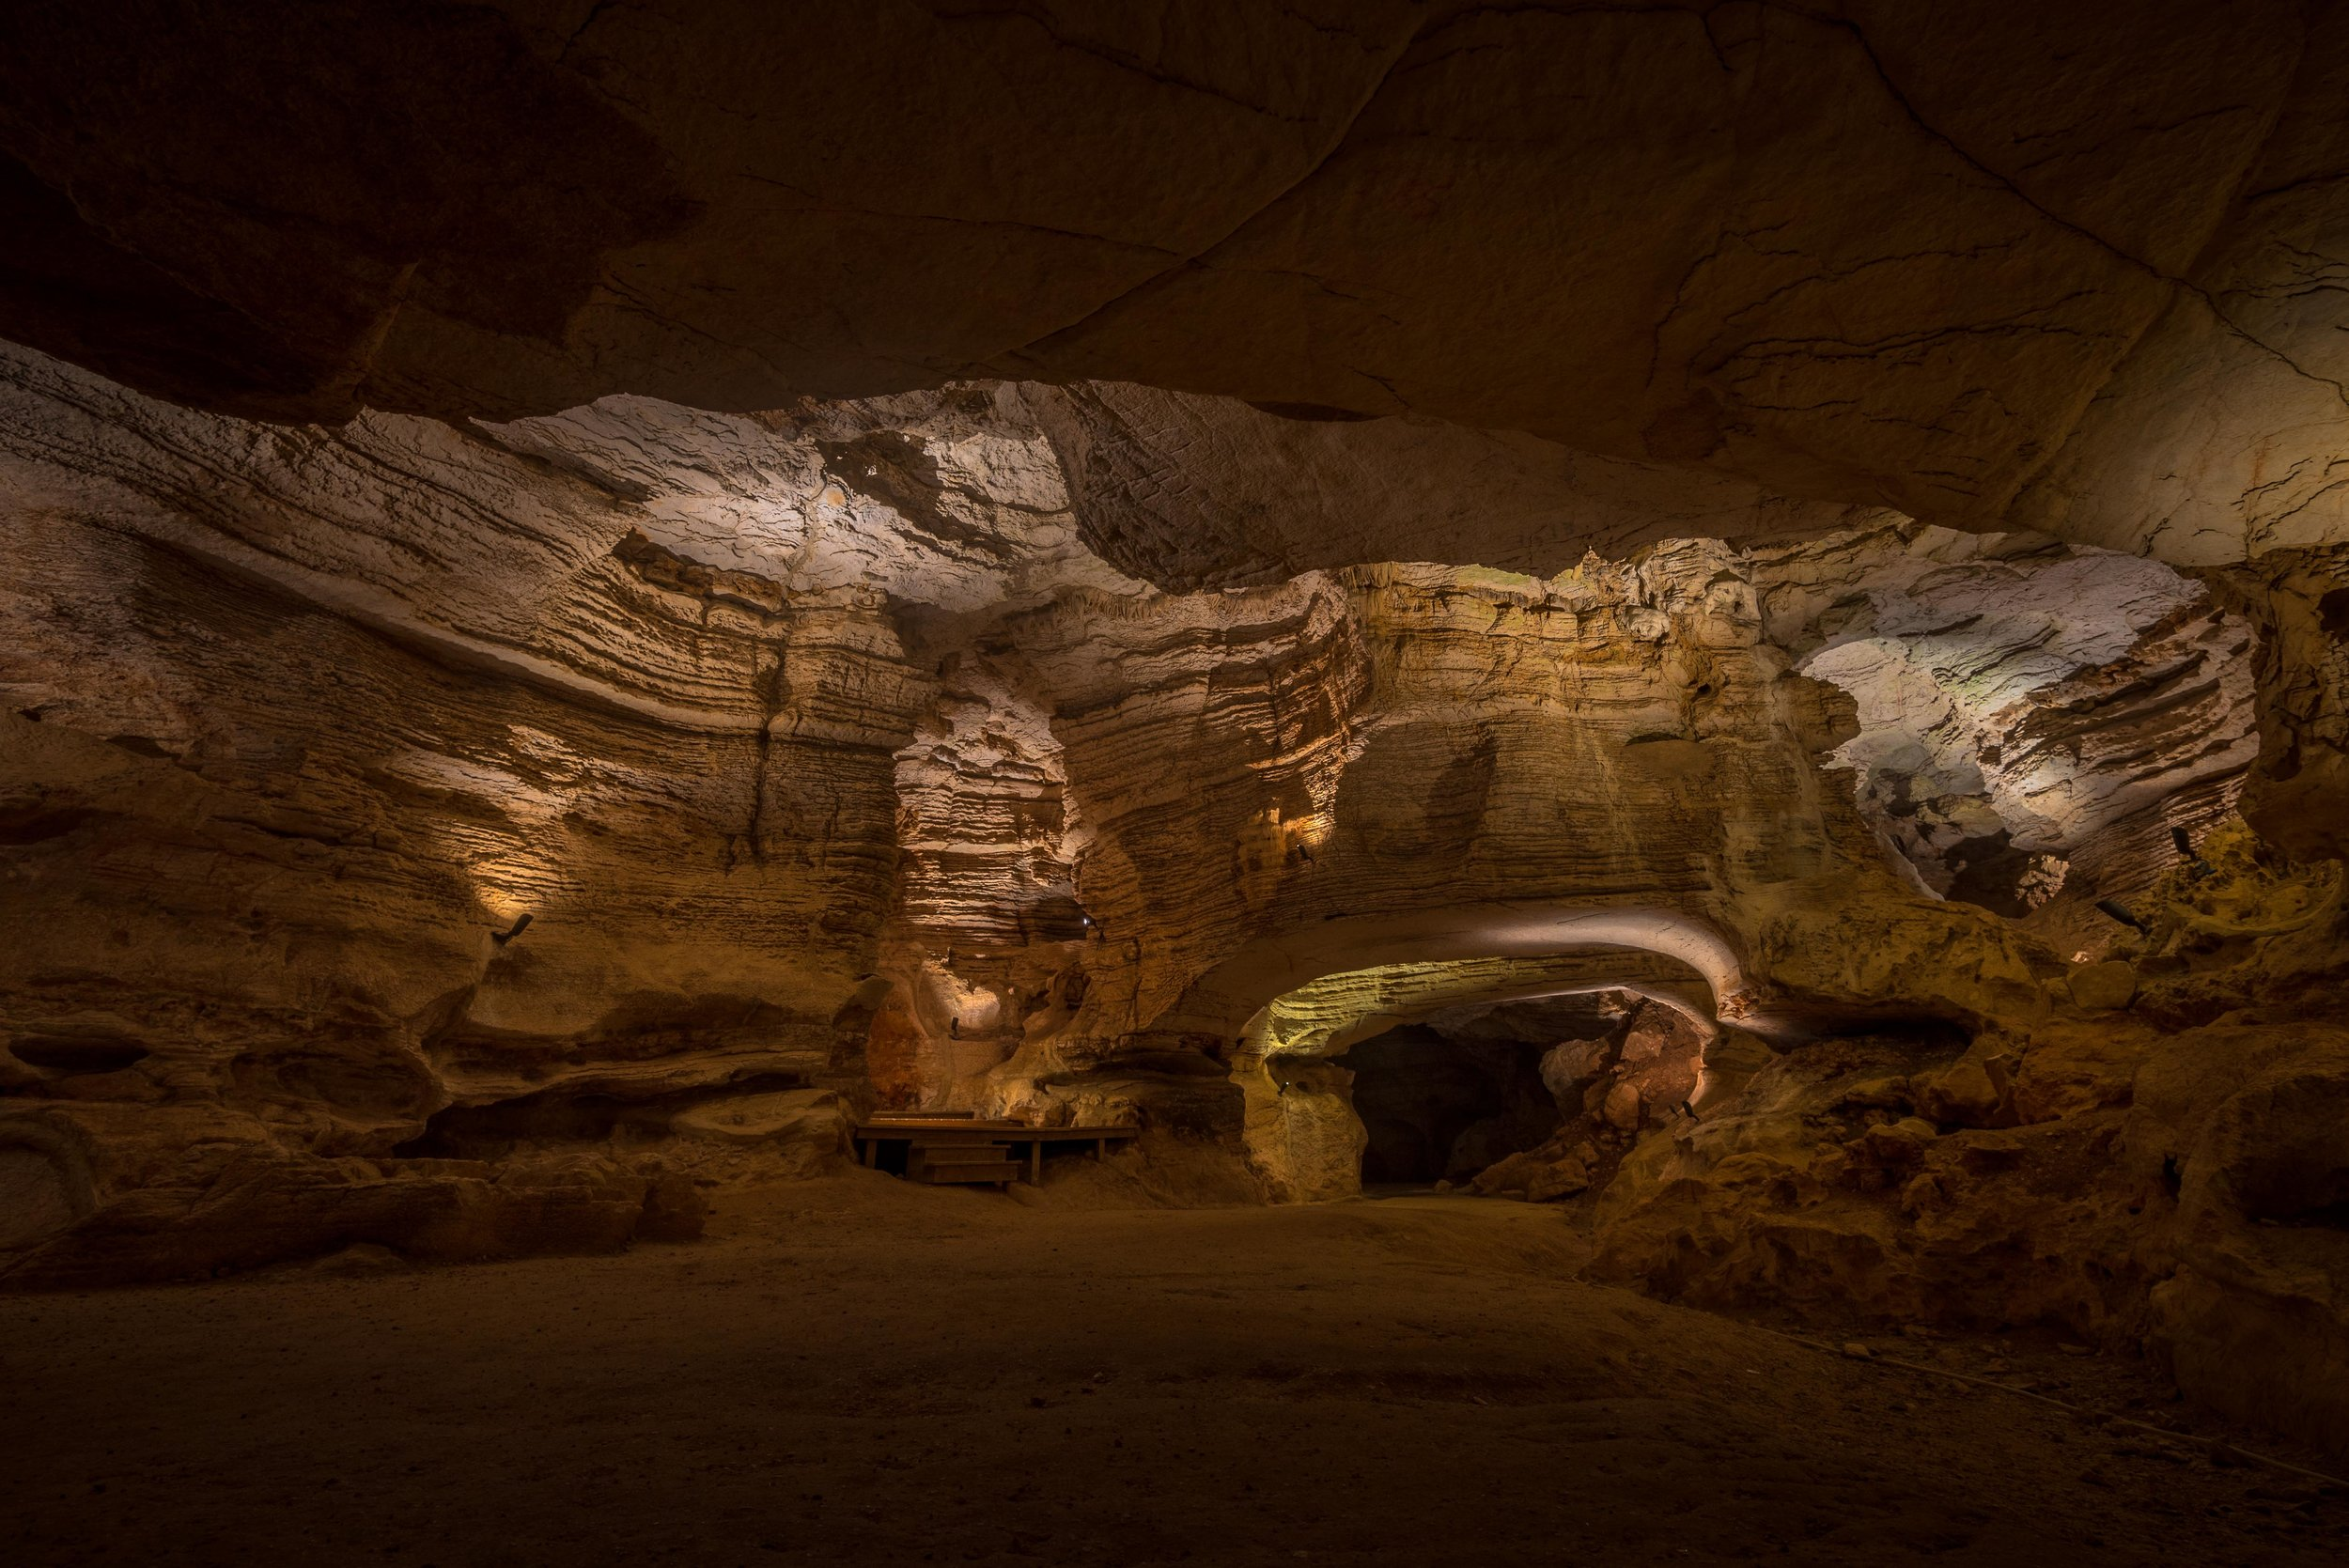 Longhorn Cavern - Texas